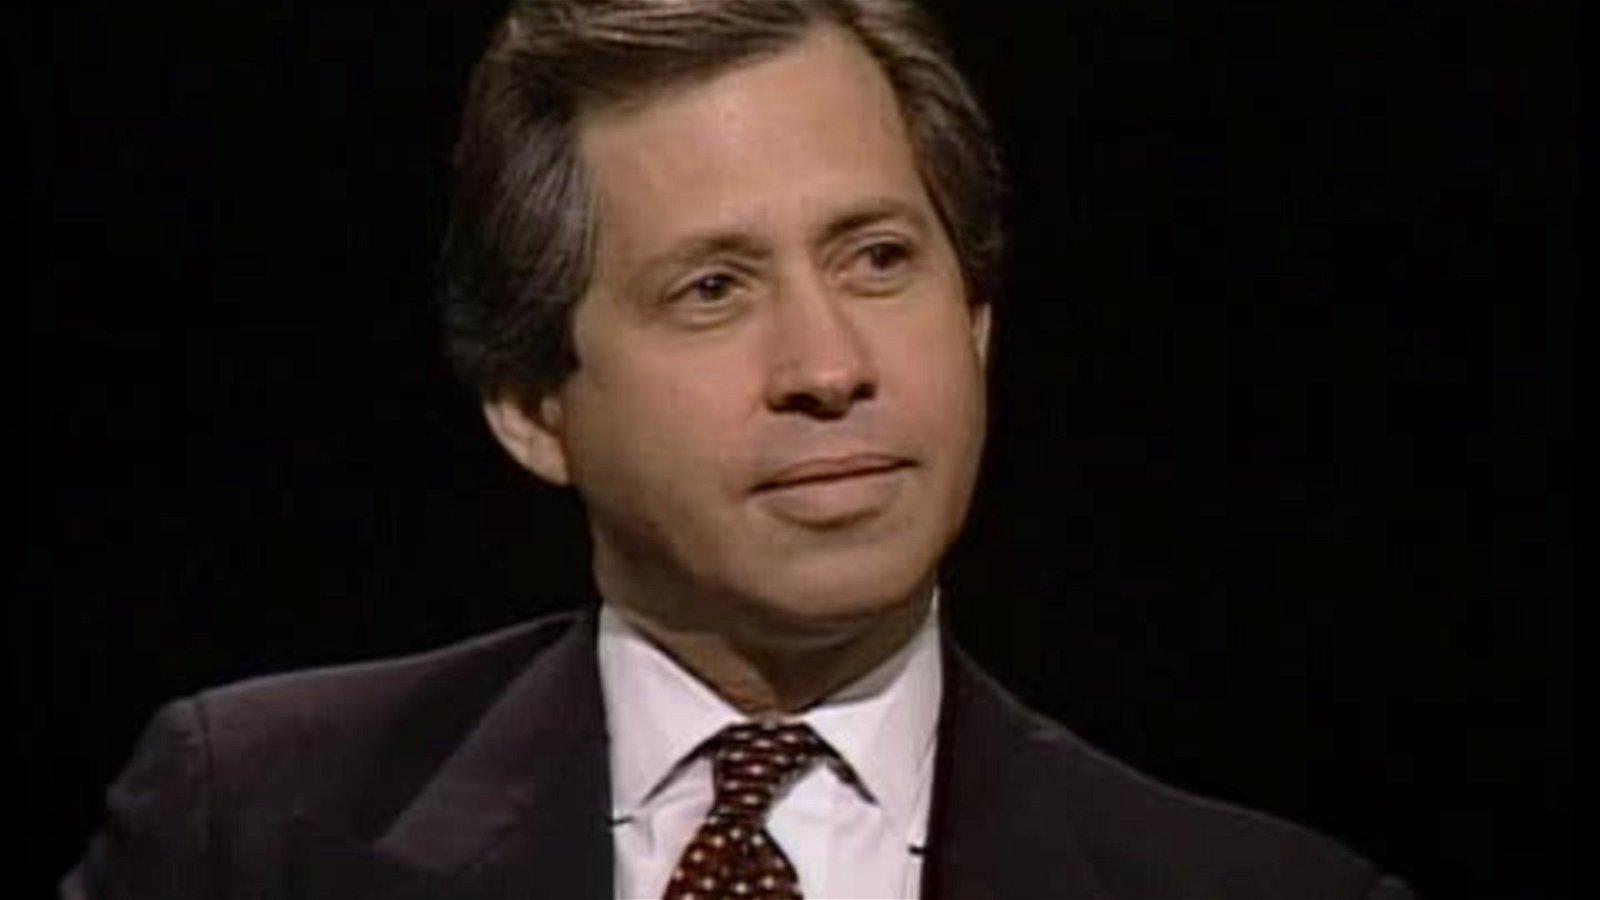 ZeniMax Co-Founder Robert A. Altman Passes Away at 73 2